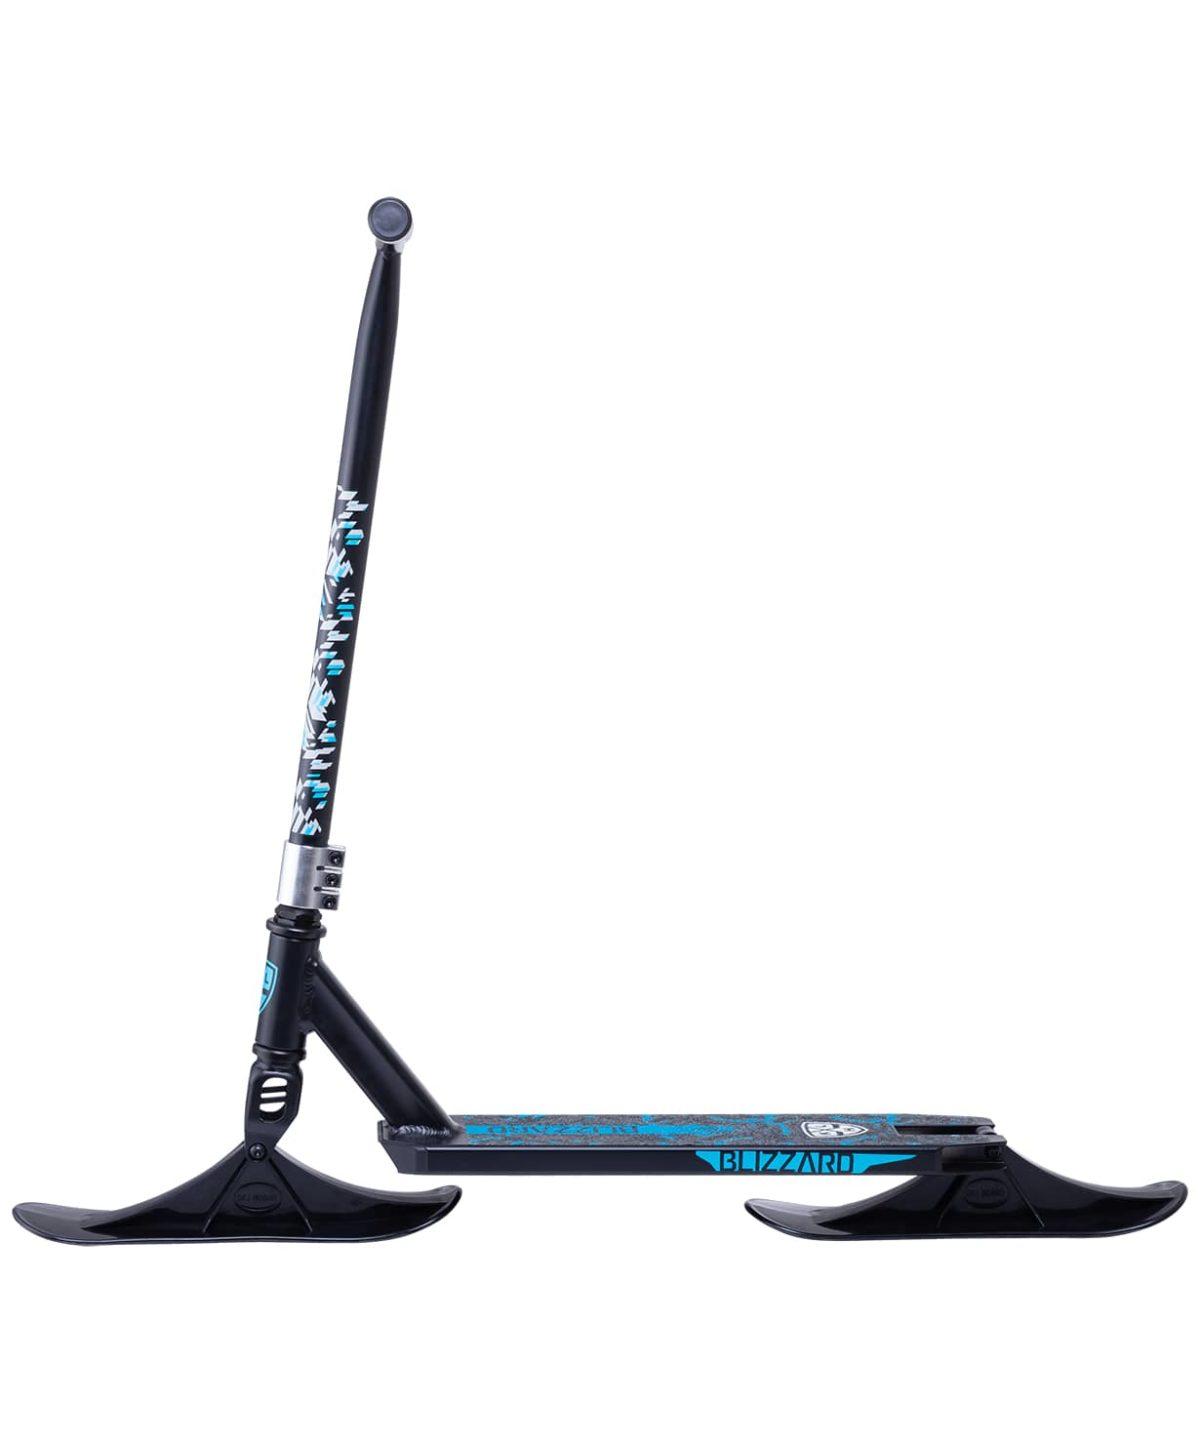 KHL Снегокат трюковый Blizzard  18245 - 7